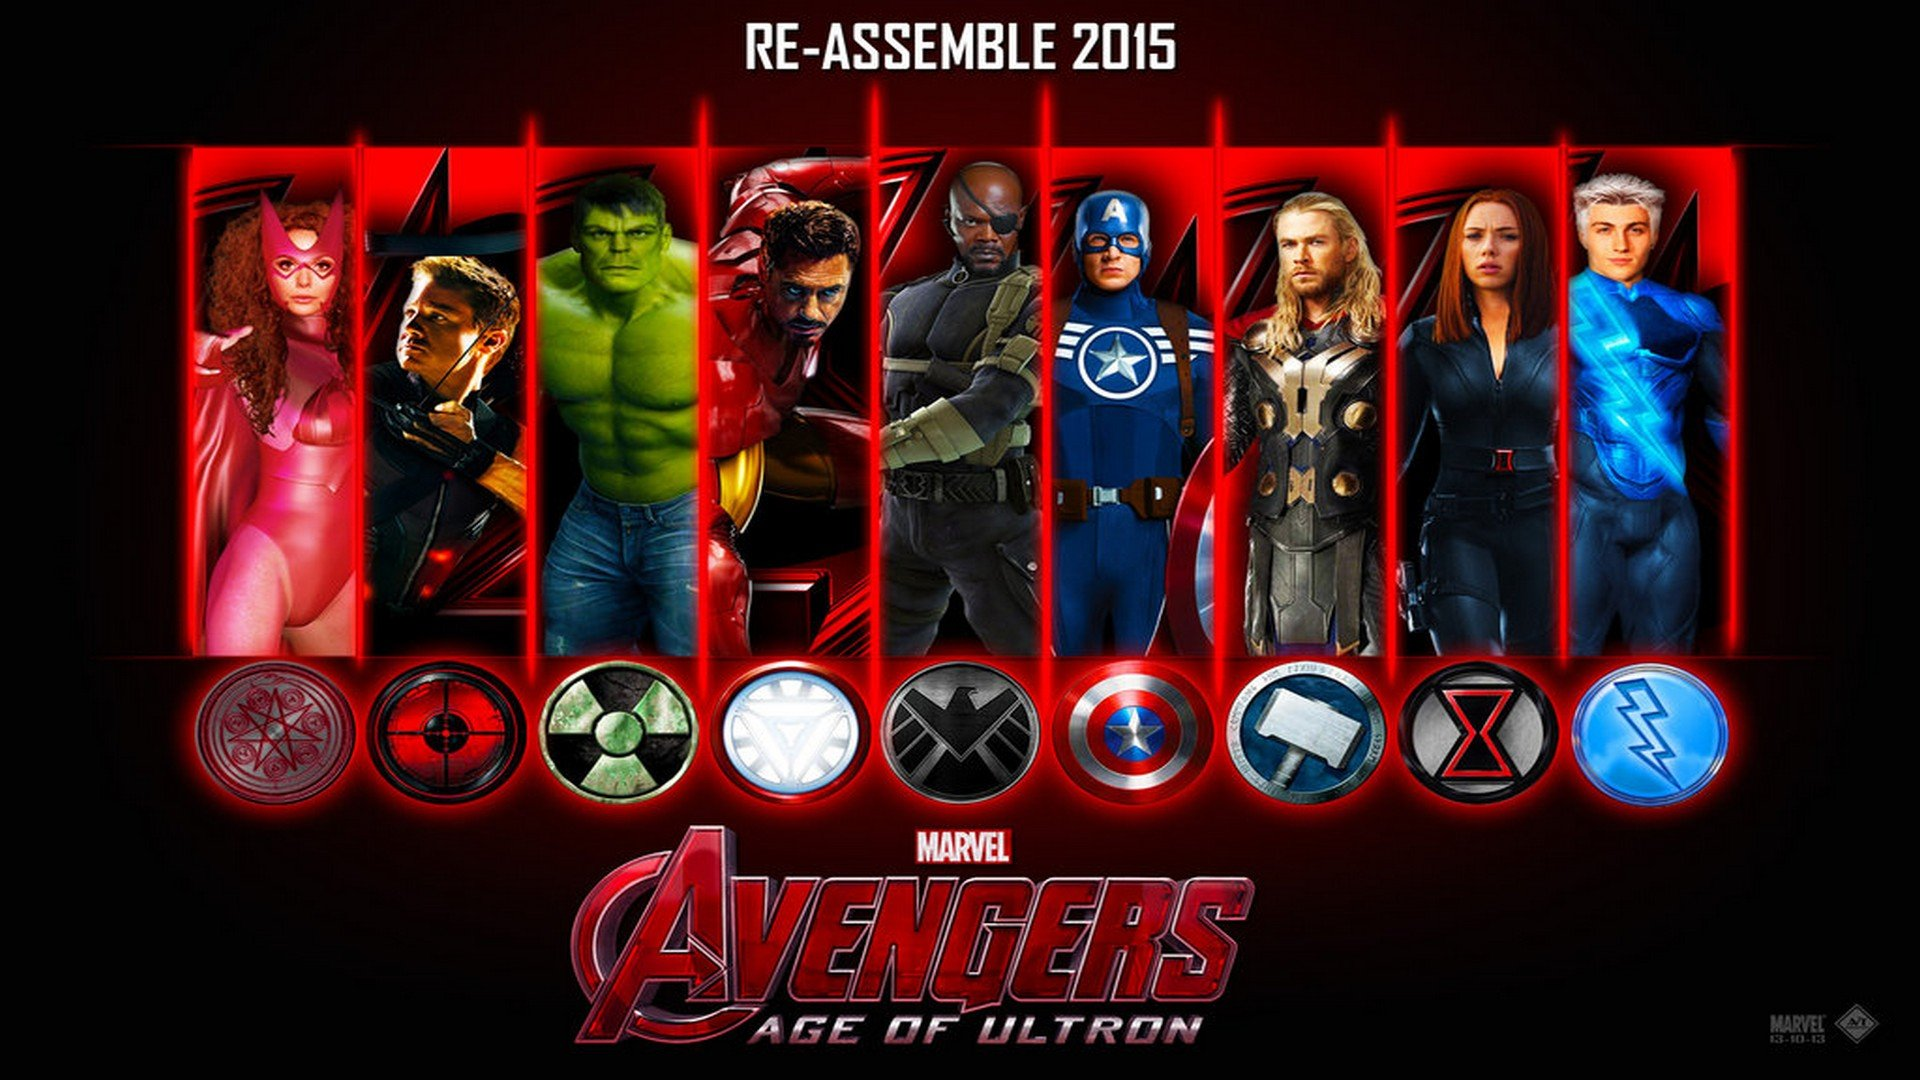 Avengers Age of Ultron 2015 Wallpaper Desktop   4   HD Wallpapers 1920x1080